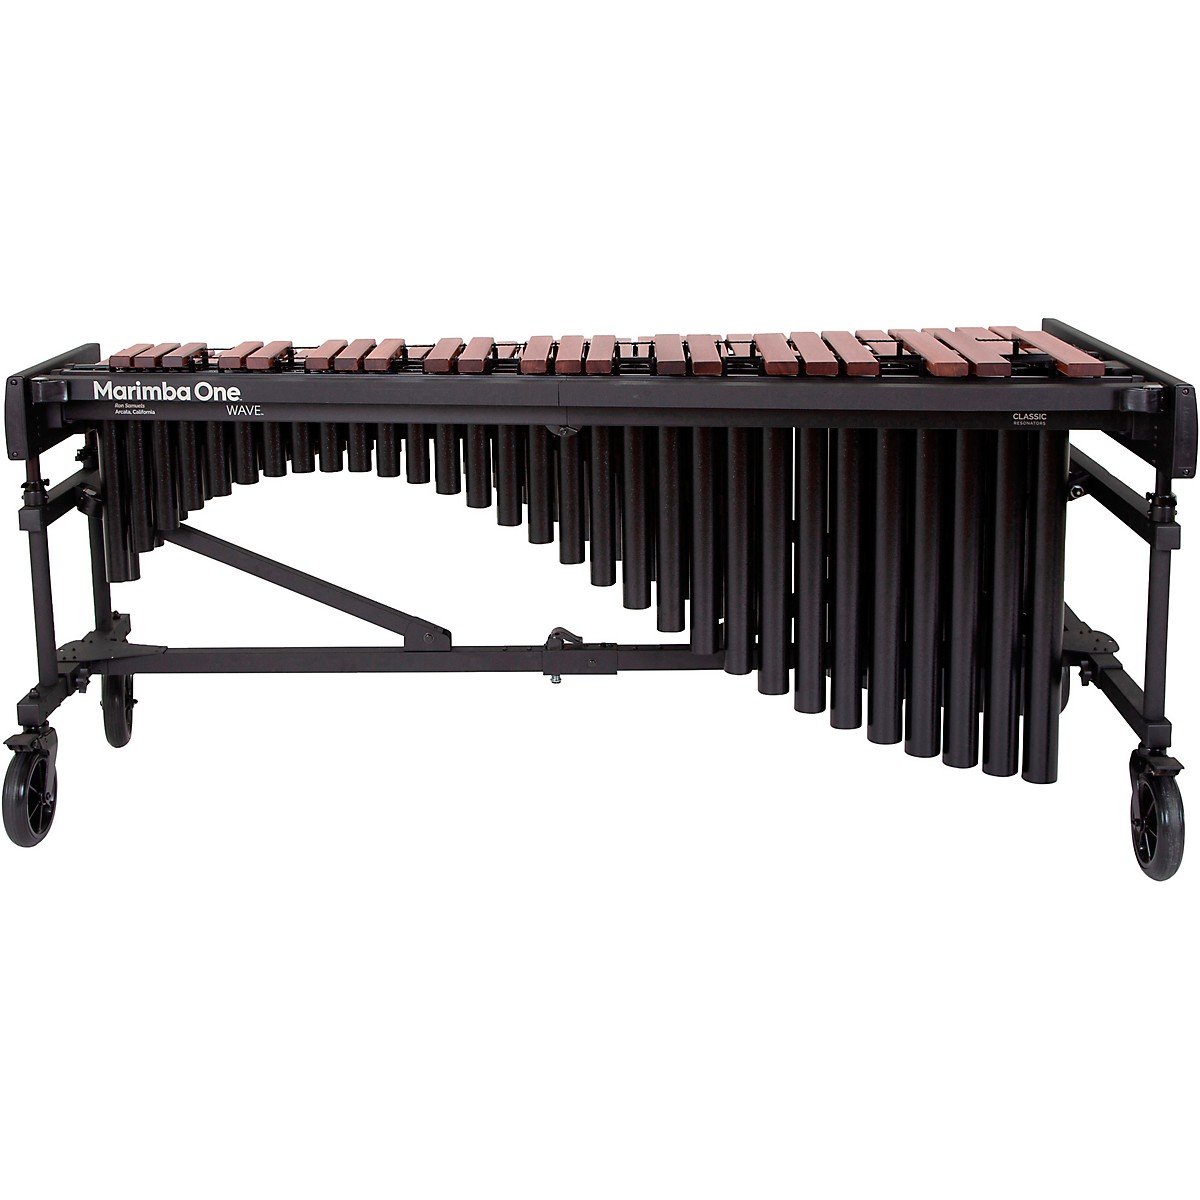 Marimba One Wave #9631 A440 4.3 Octave Marimba with Traditional Keyboard and Classic Resonators 8